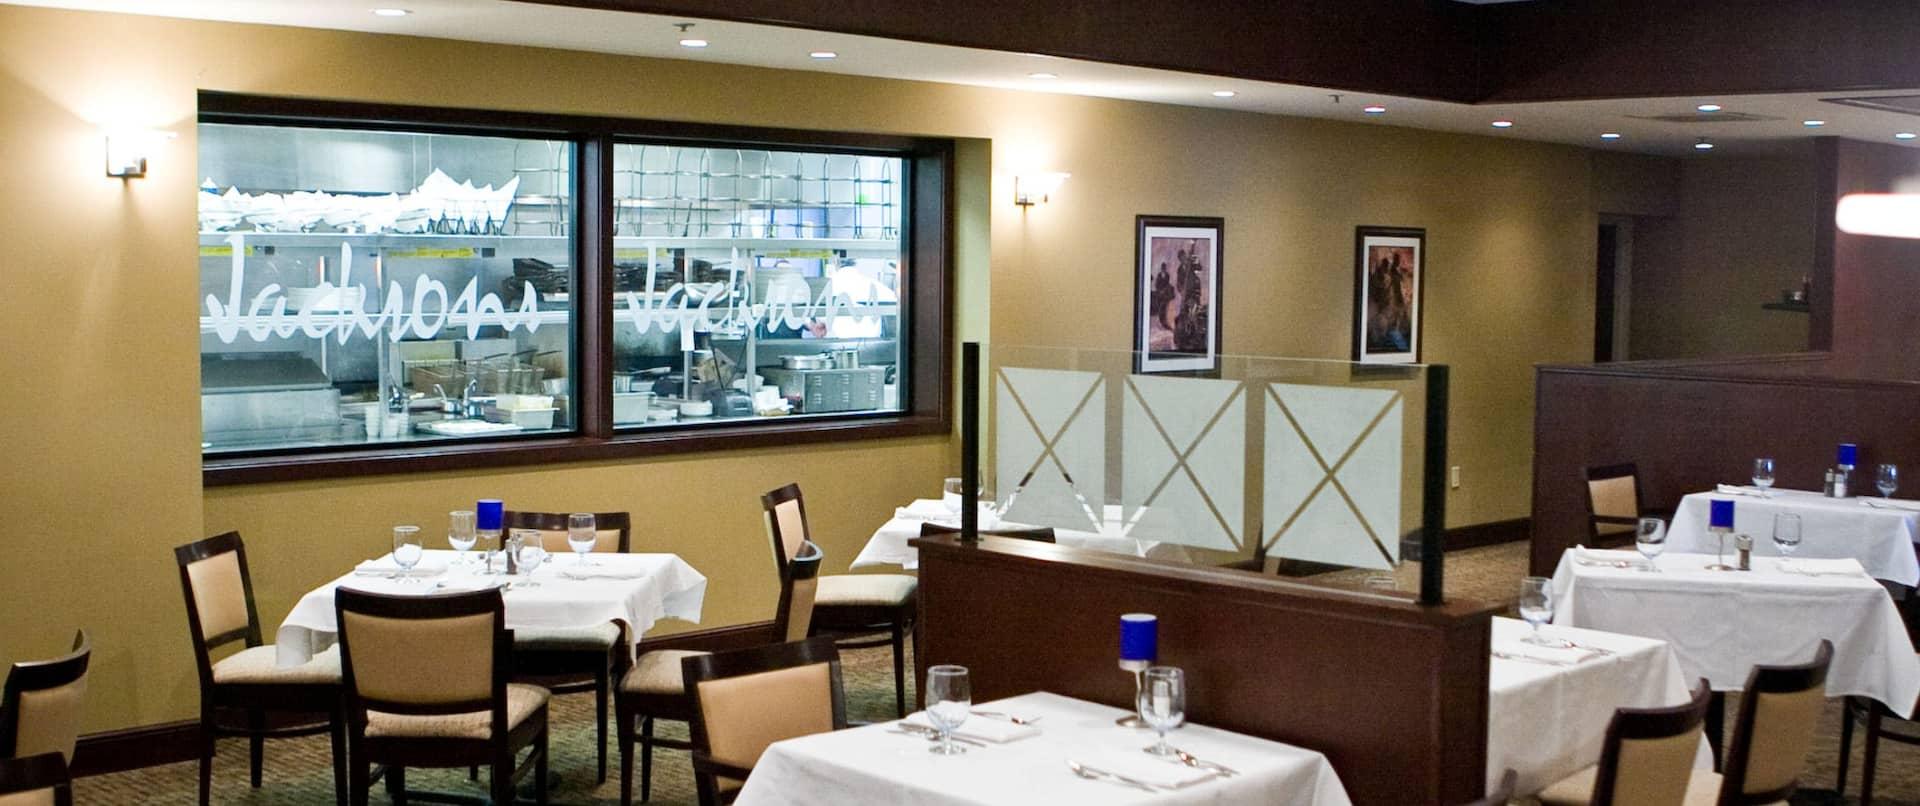 Jacksons Restaurant Seating